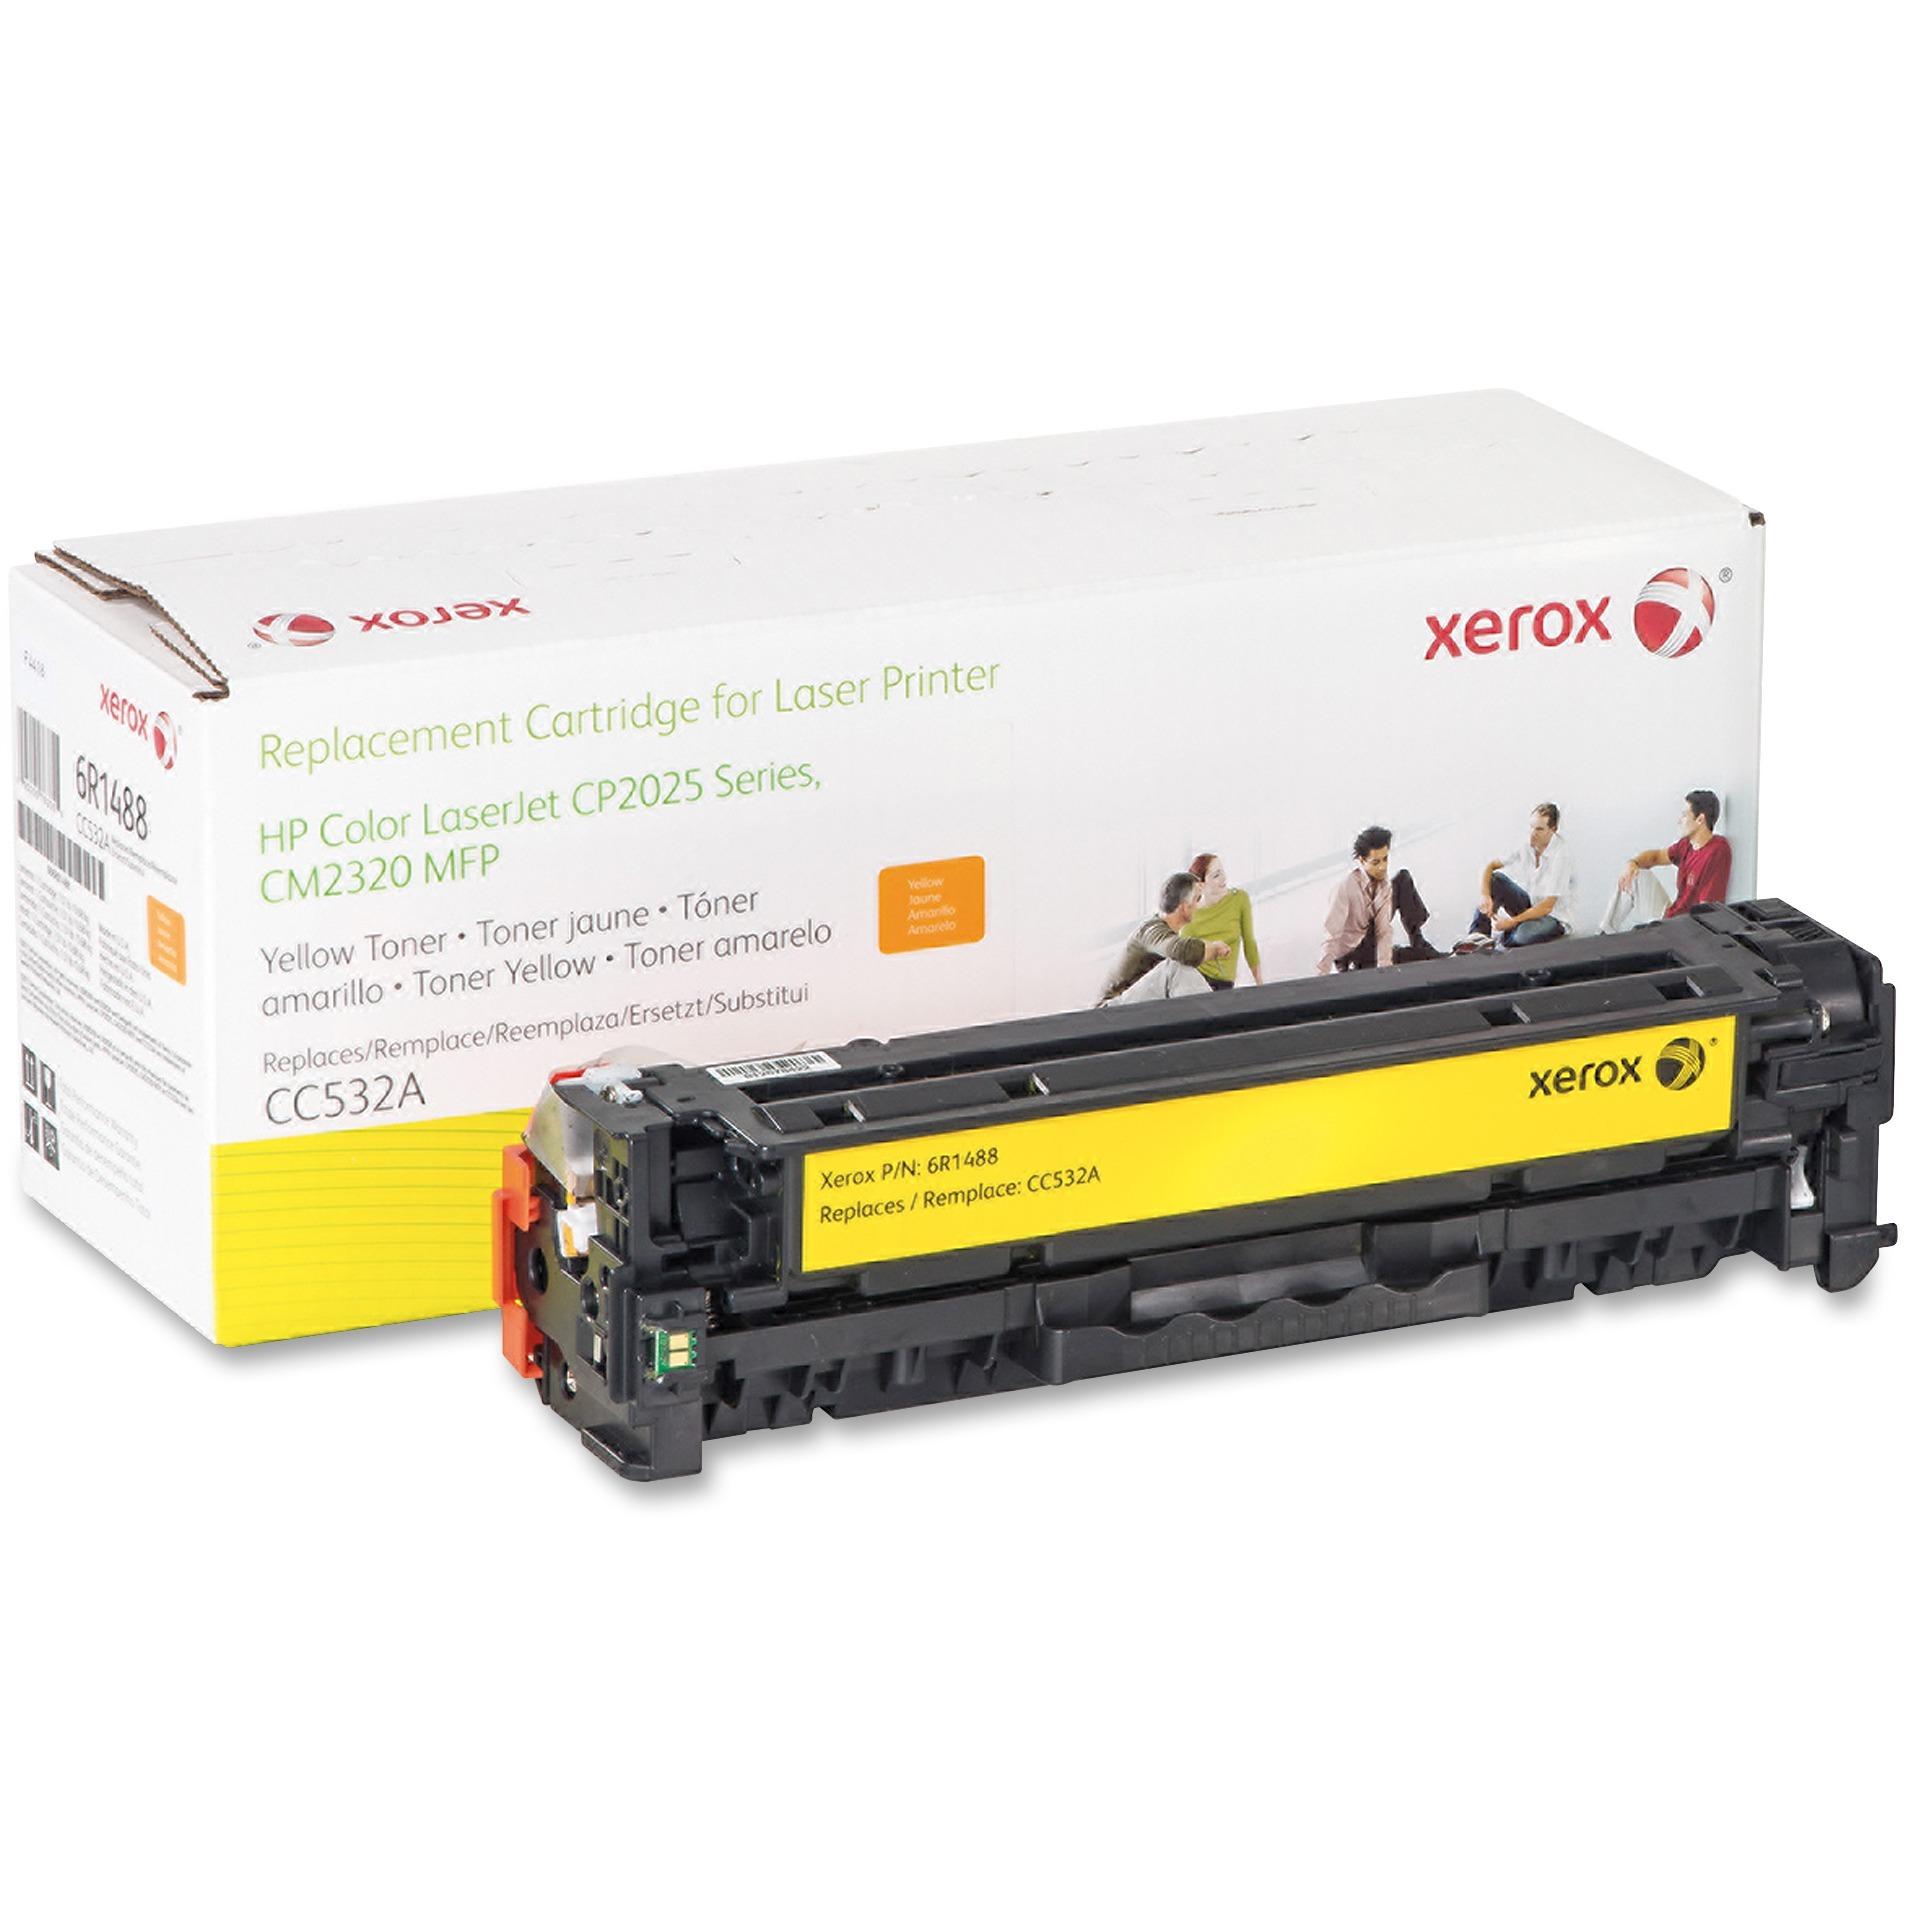 Xerox, XER6R1488, Replacement HP 304A Toner Cartridge, 1 Each